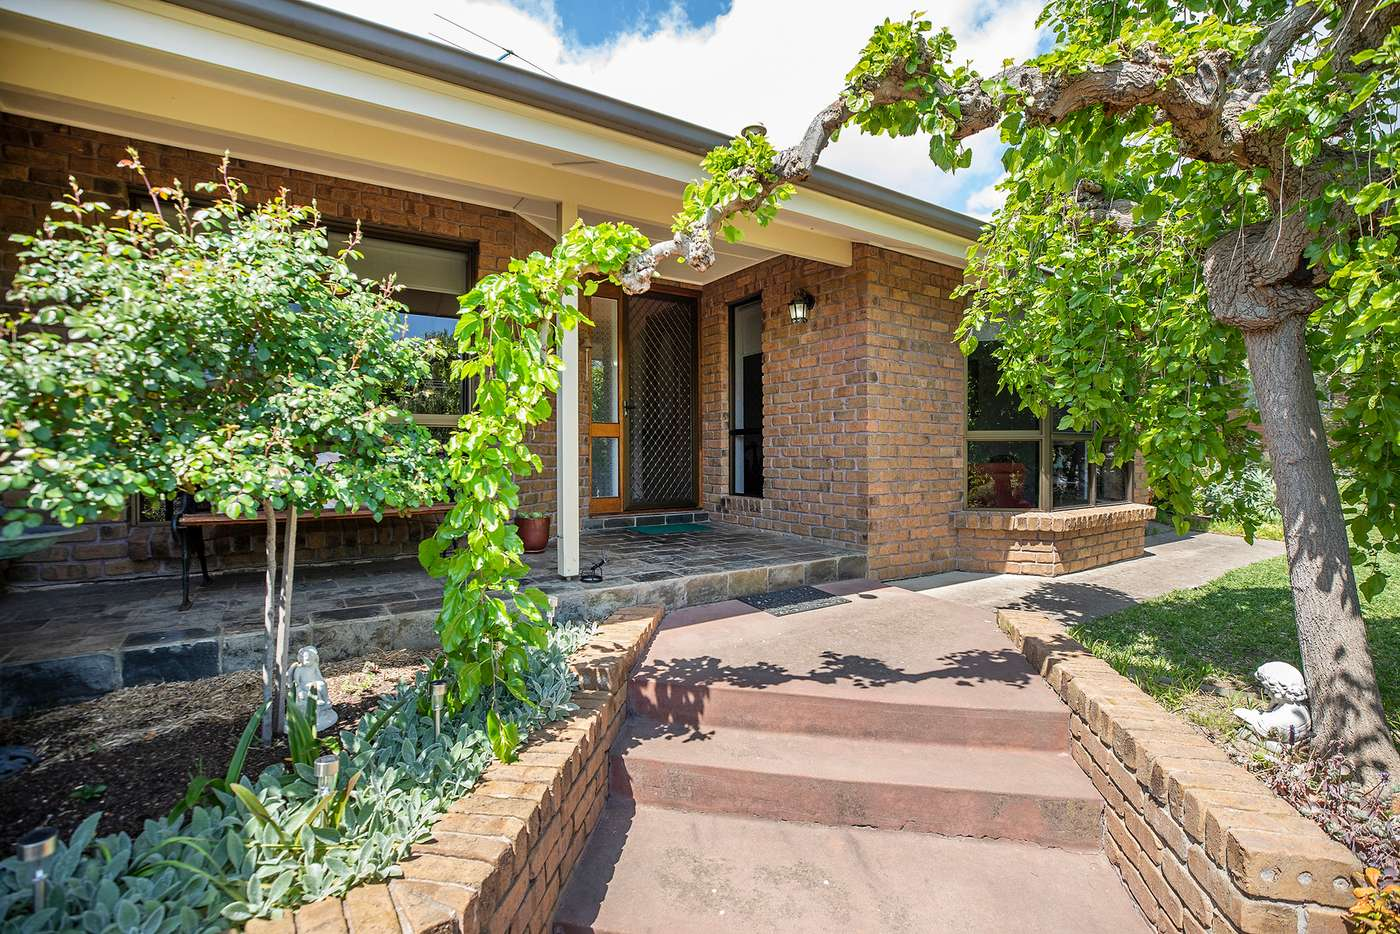 Main view of Homely house listing, 22 Wandilla Street, Seaview Downs SA 5049